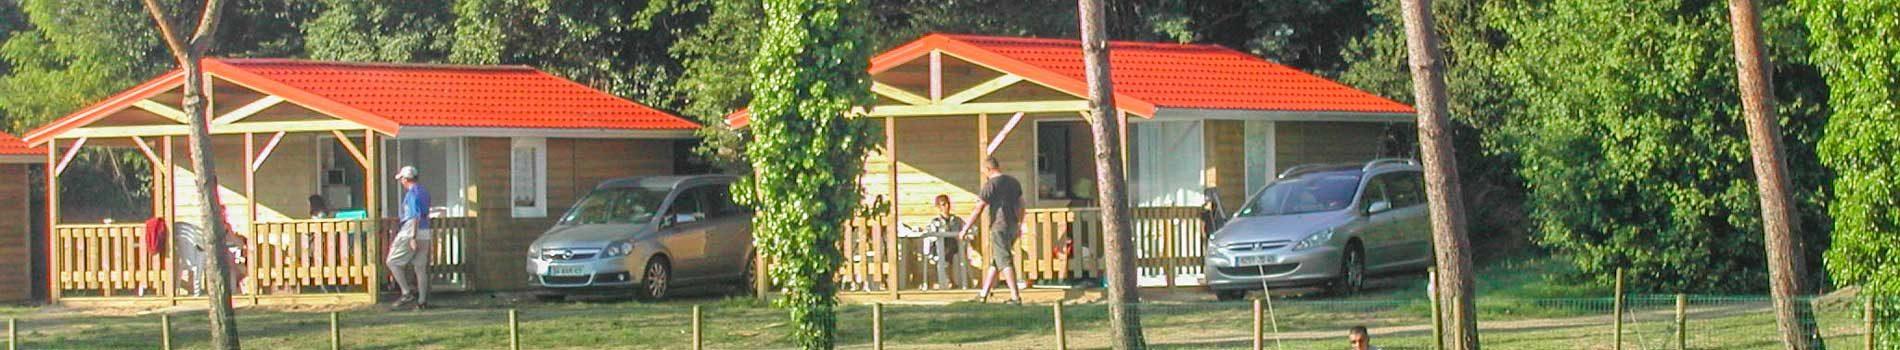 location chalet lac camping vendée